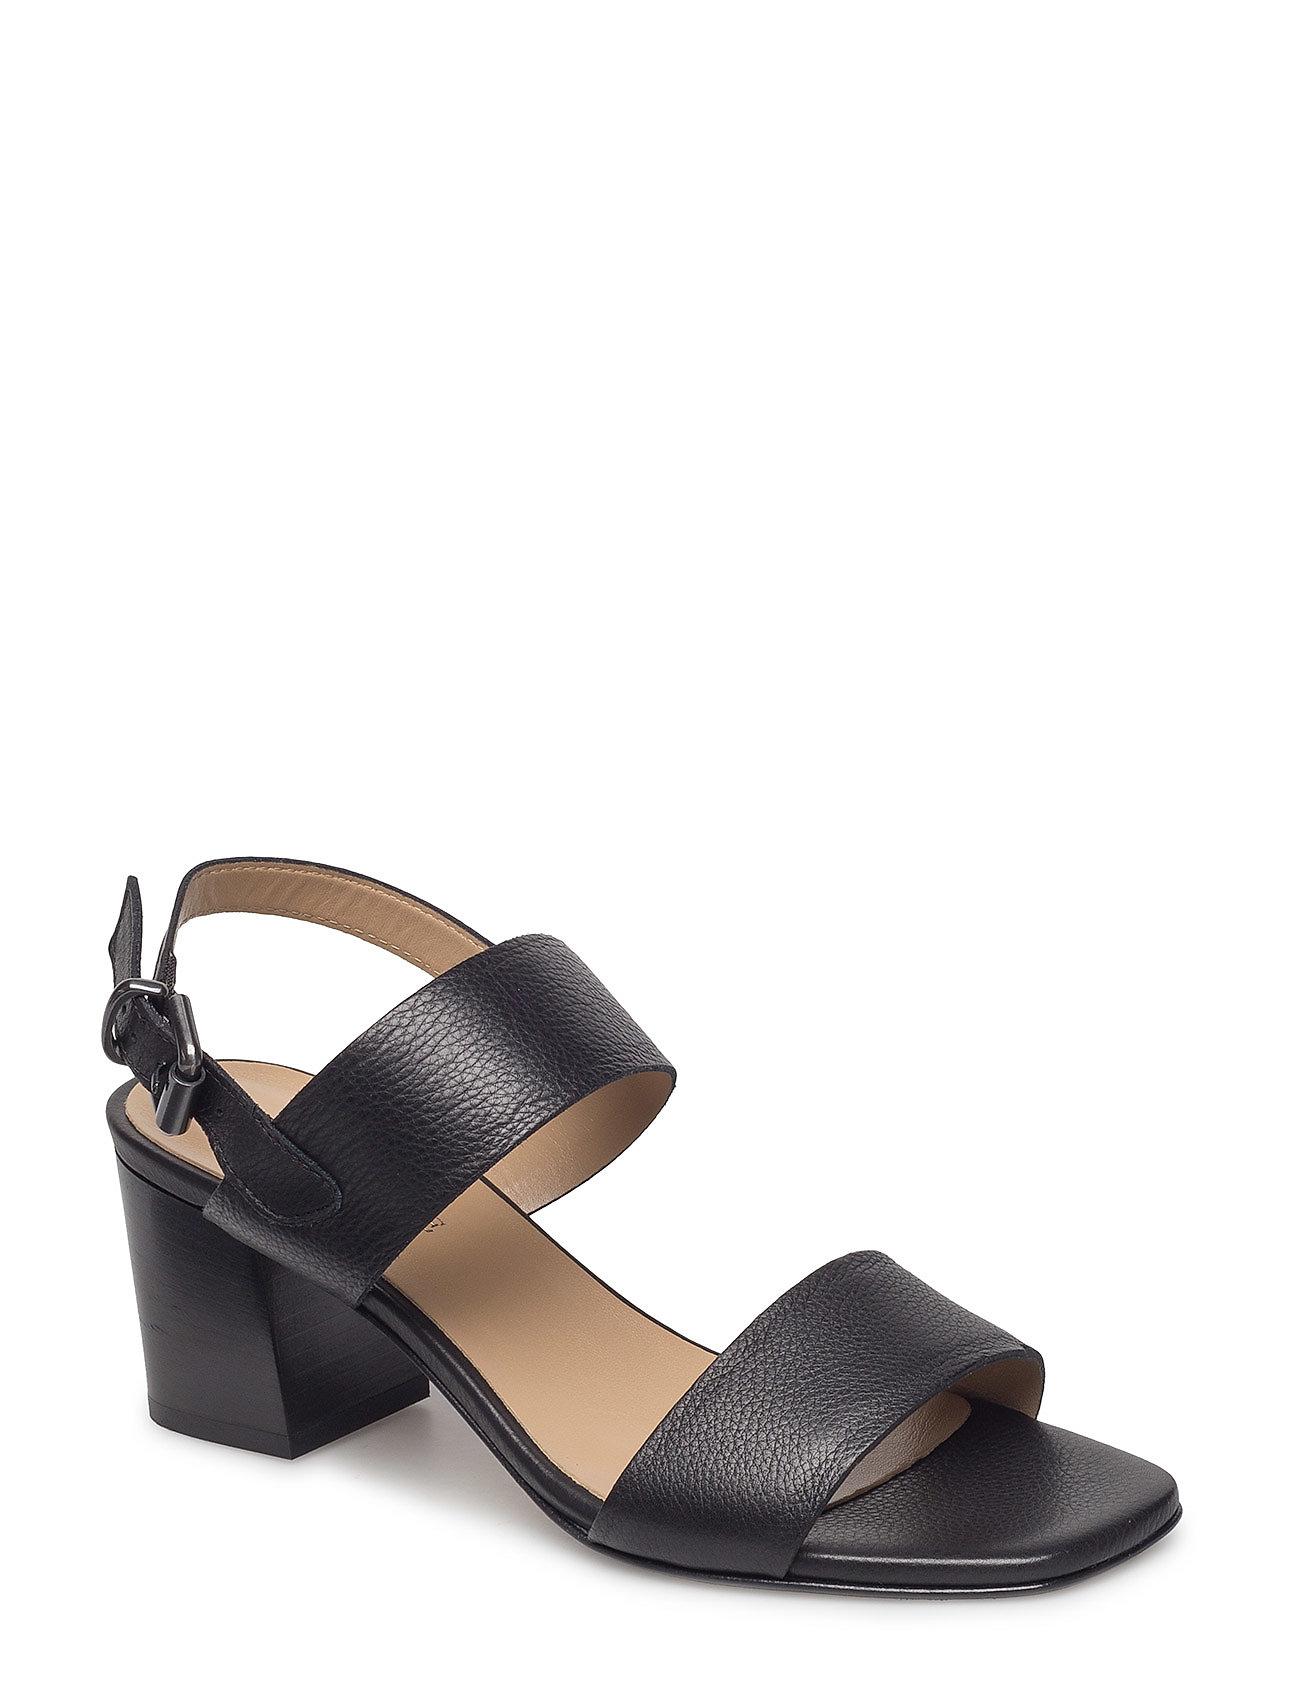 d26e8e3d83b Paola højhælede sandaler fra NOTABENE til dame i BLACK LEATHER ...